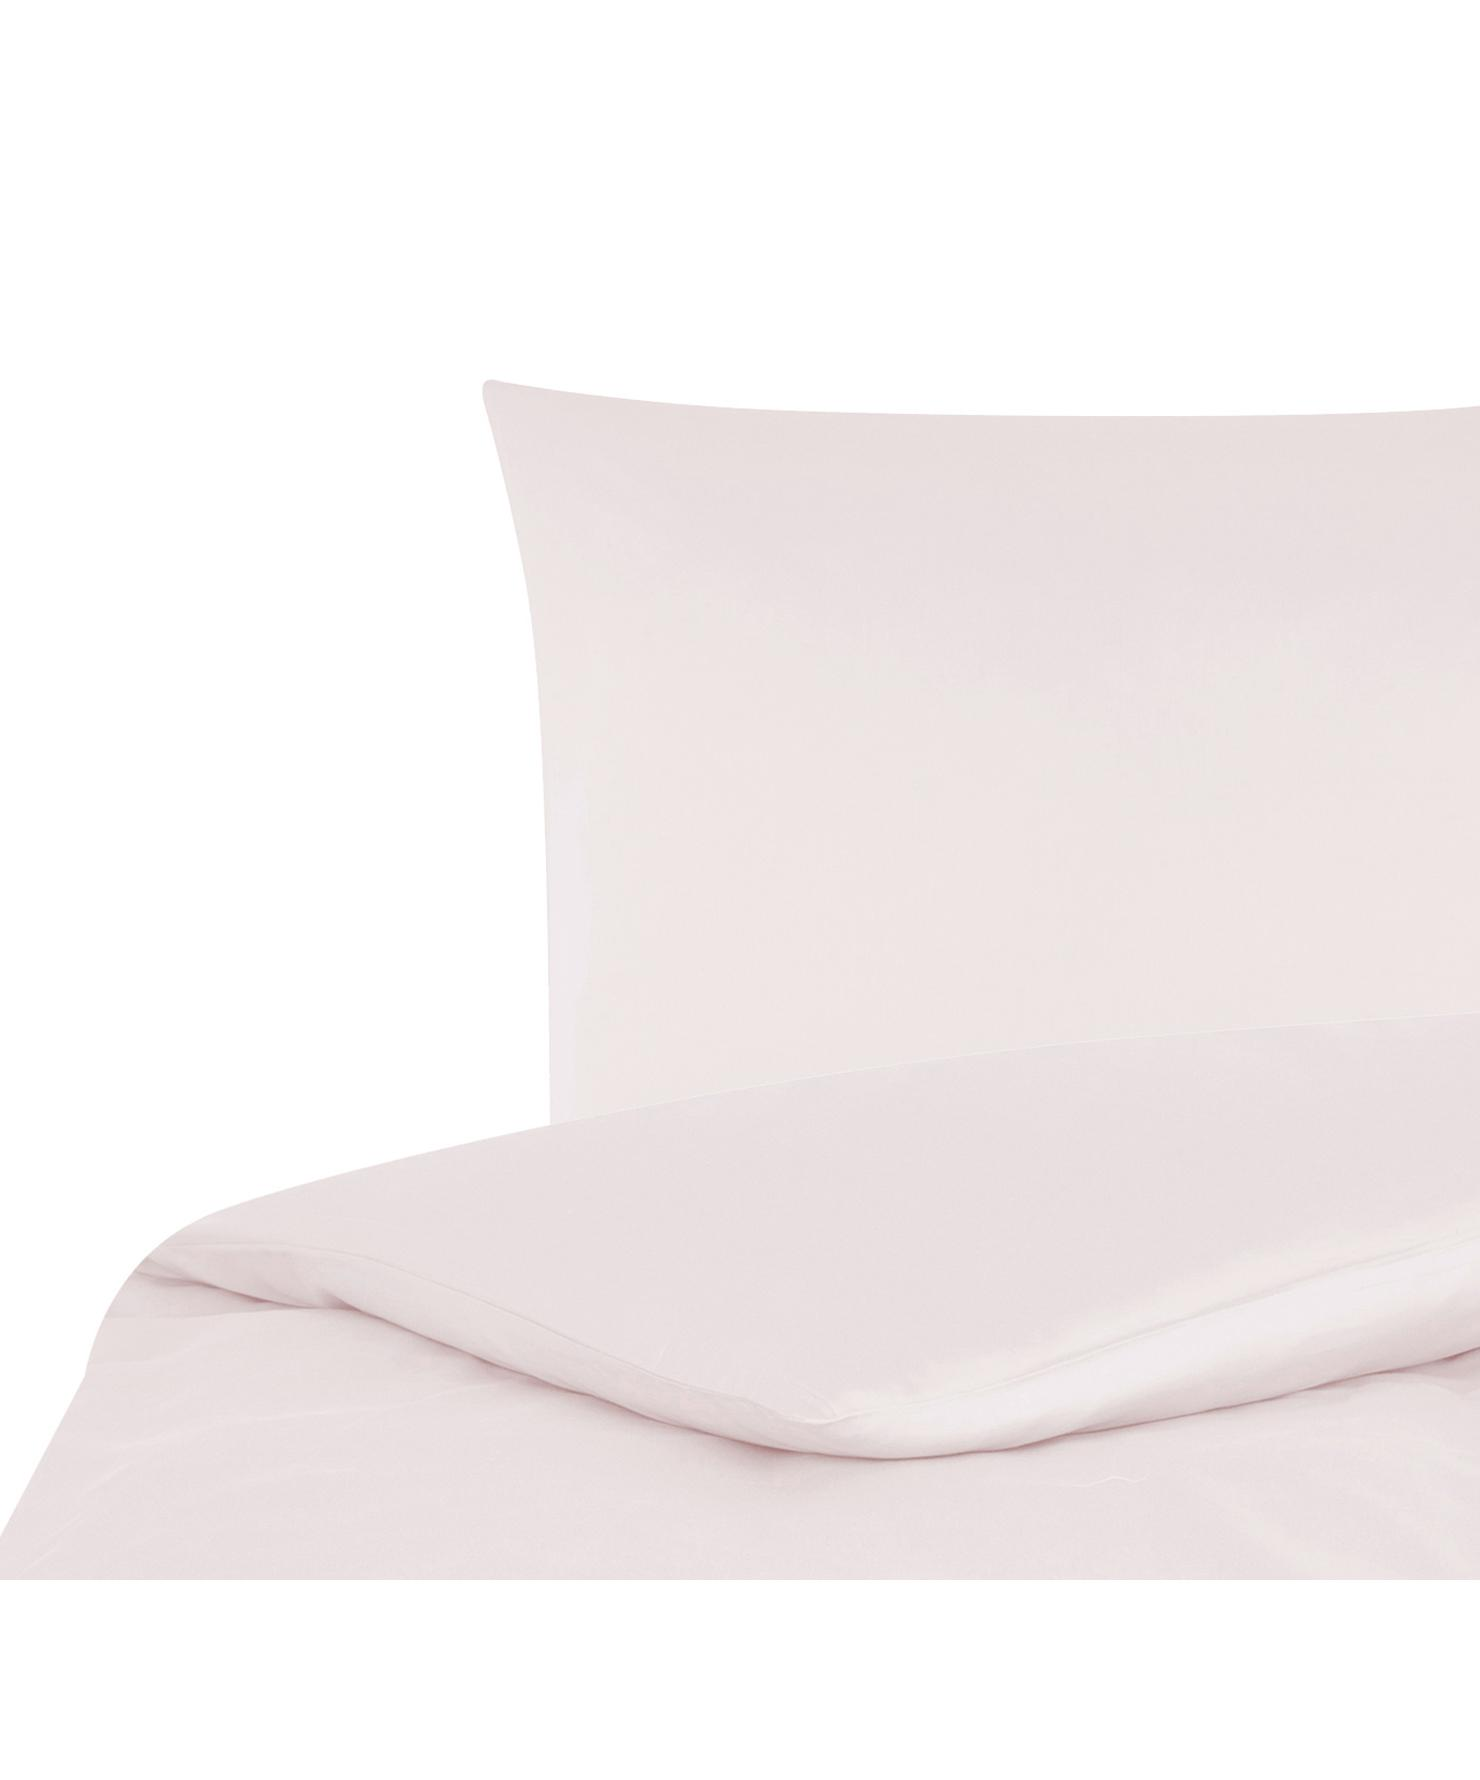 Funda nórdica de satén Comfort, Rosa, Cama 90 cm (150 x 200 cm)